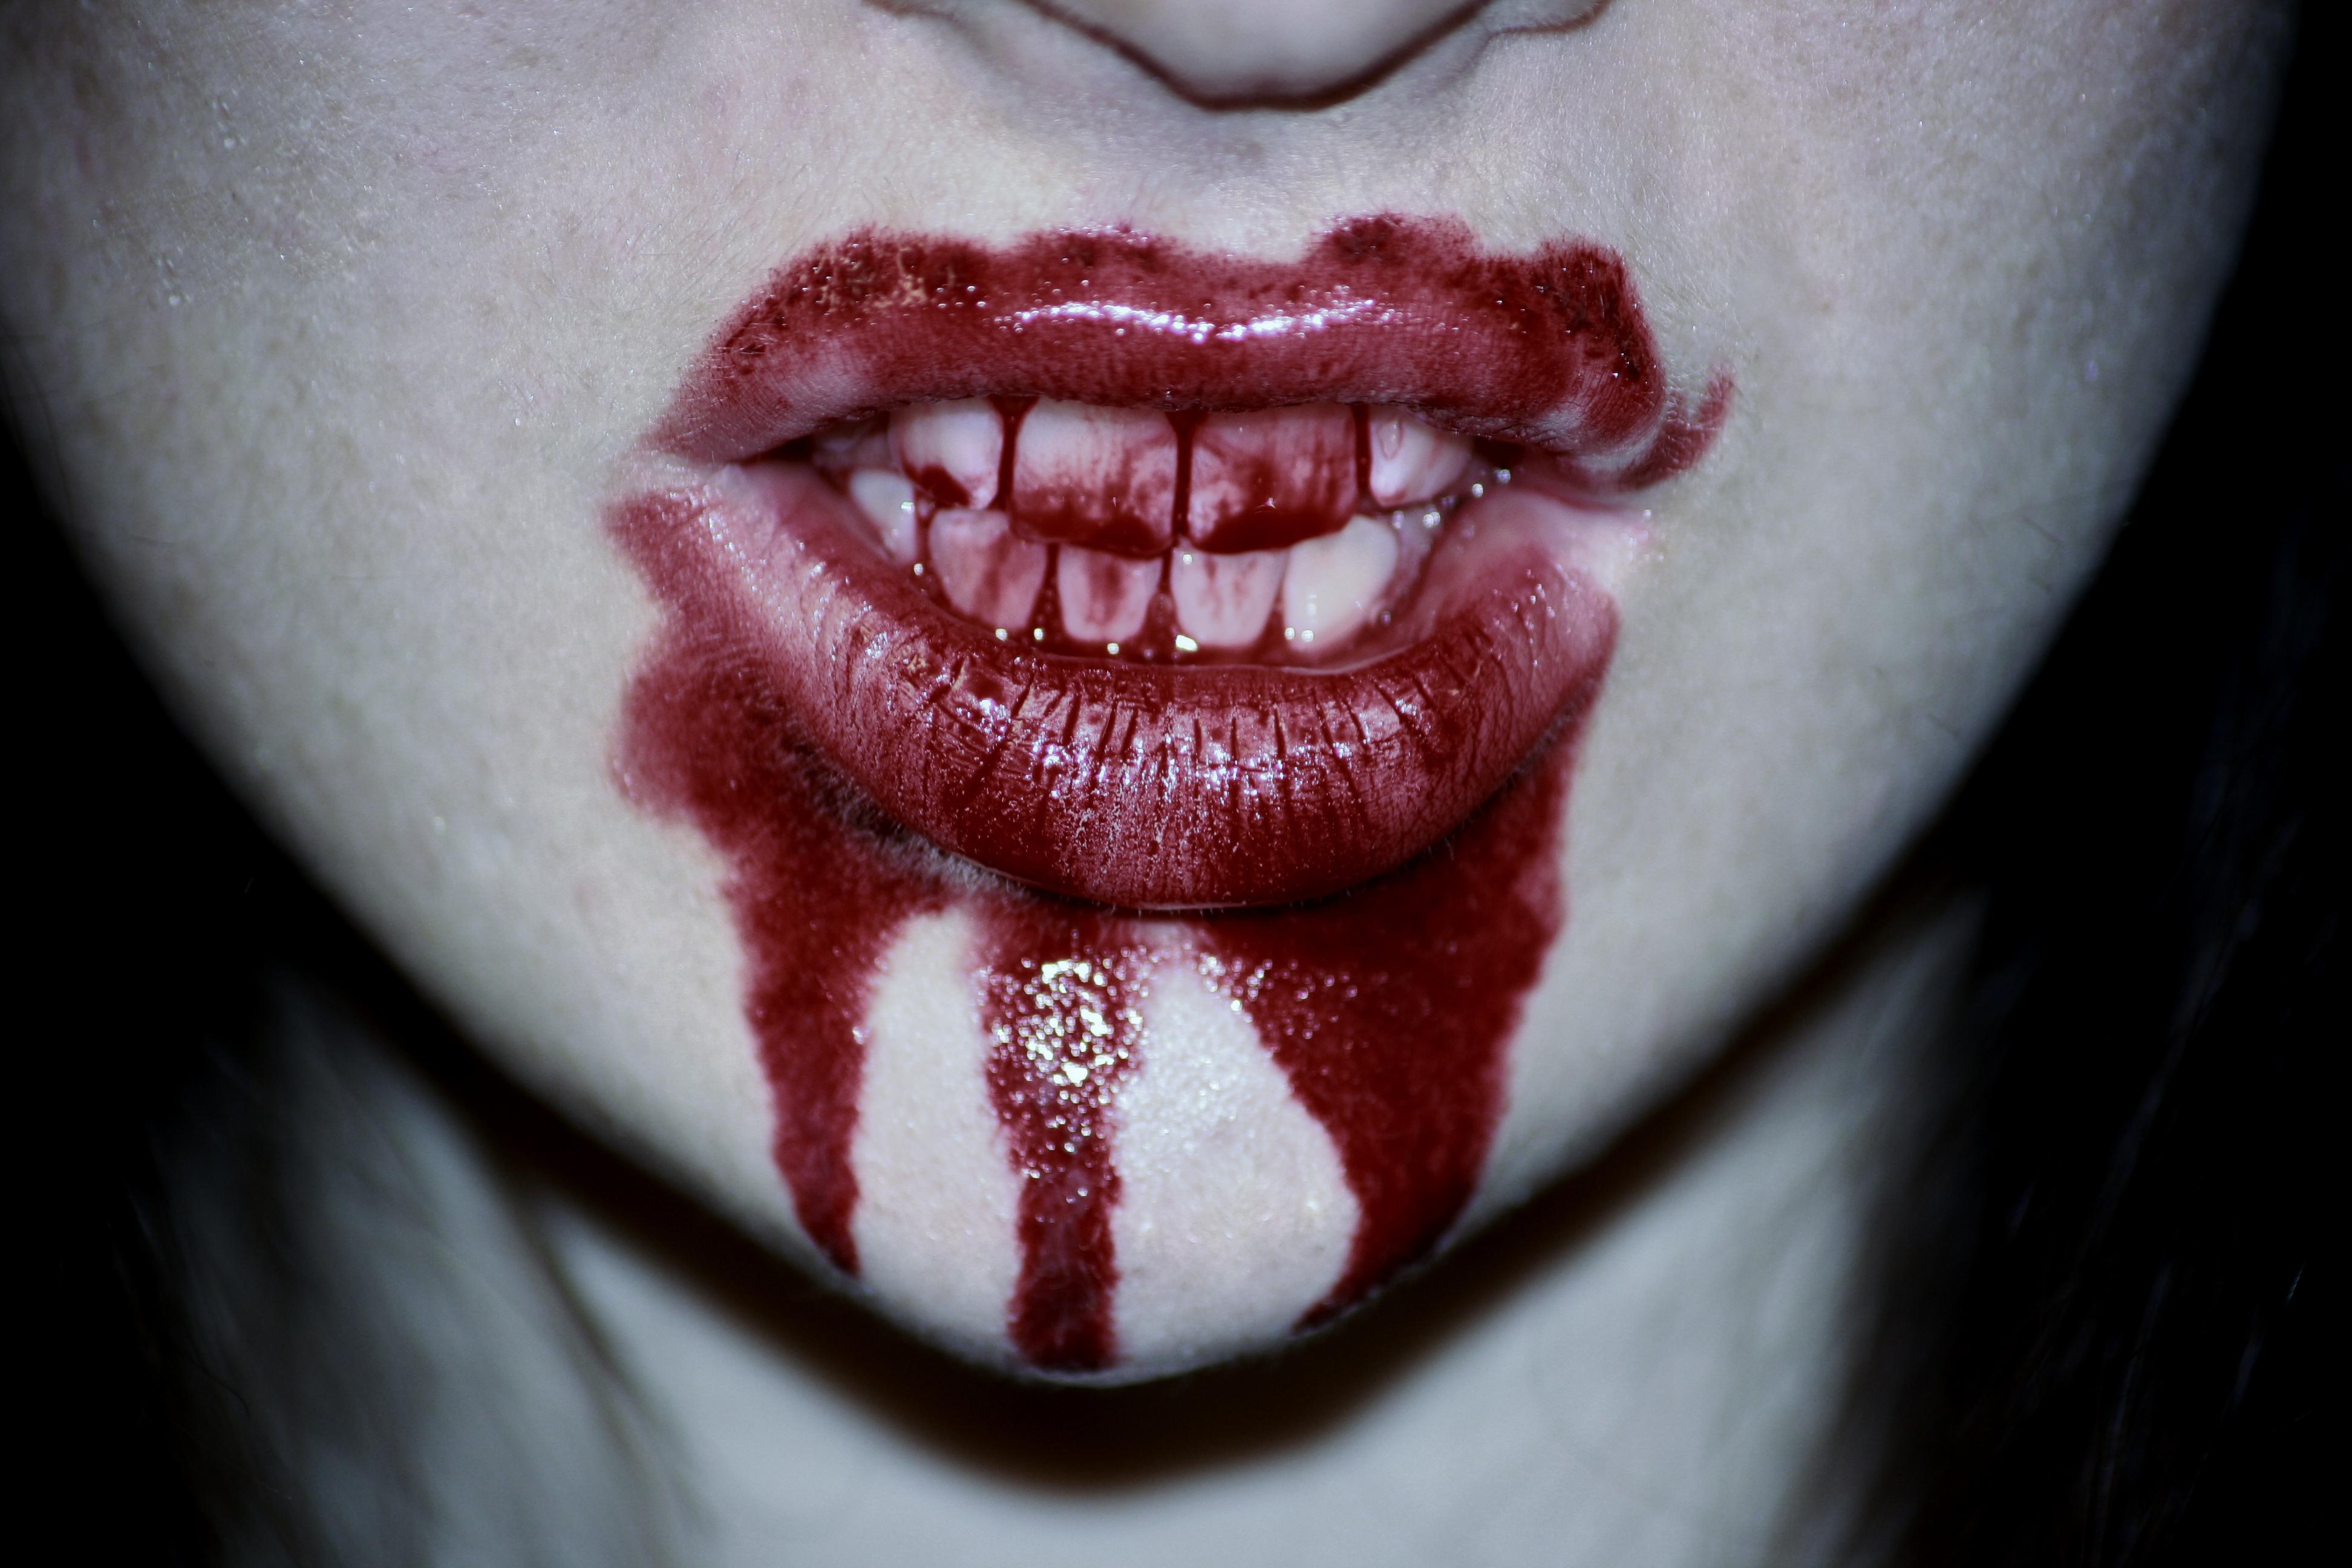 Картинка кровавая улыбка